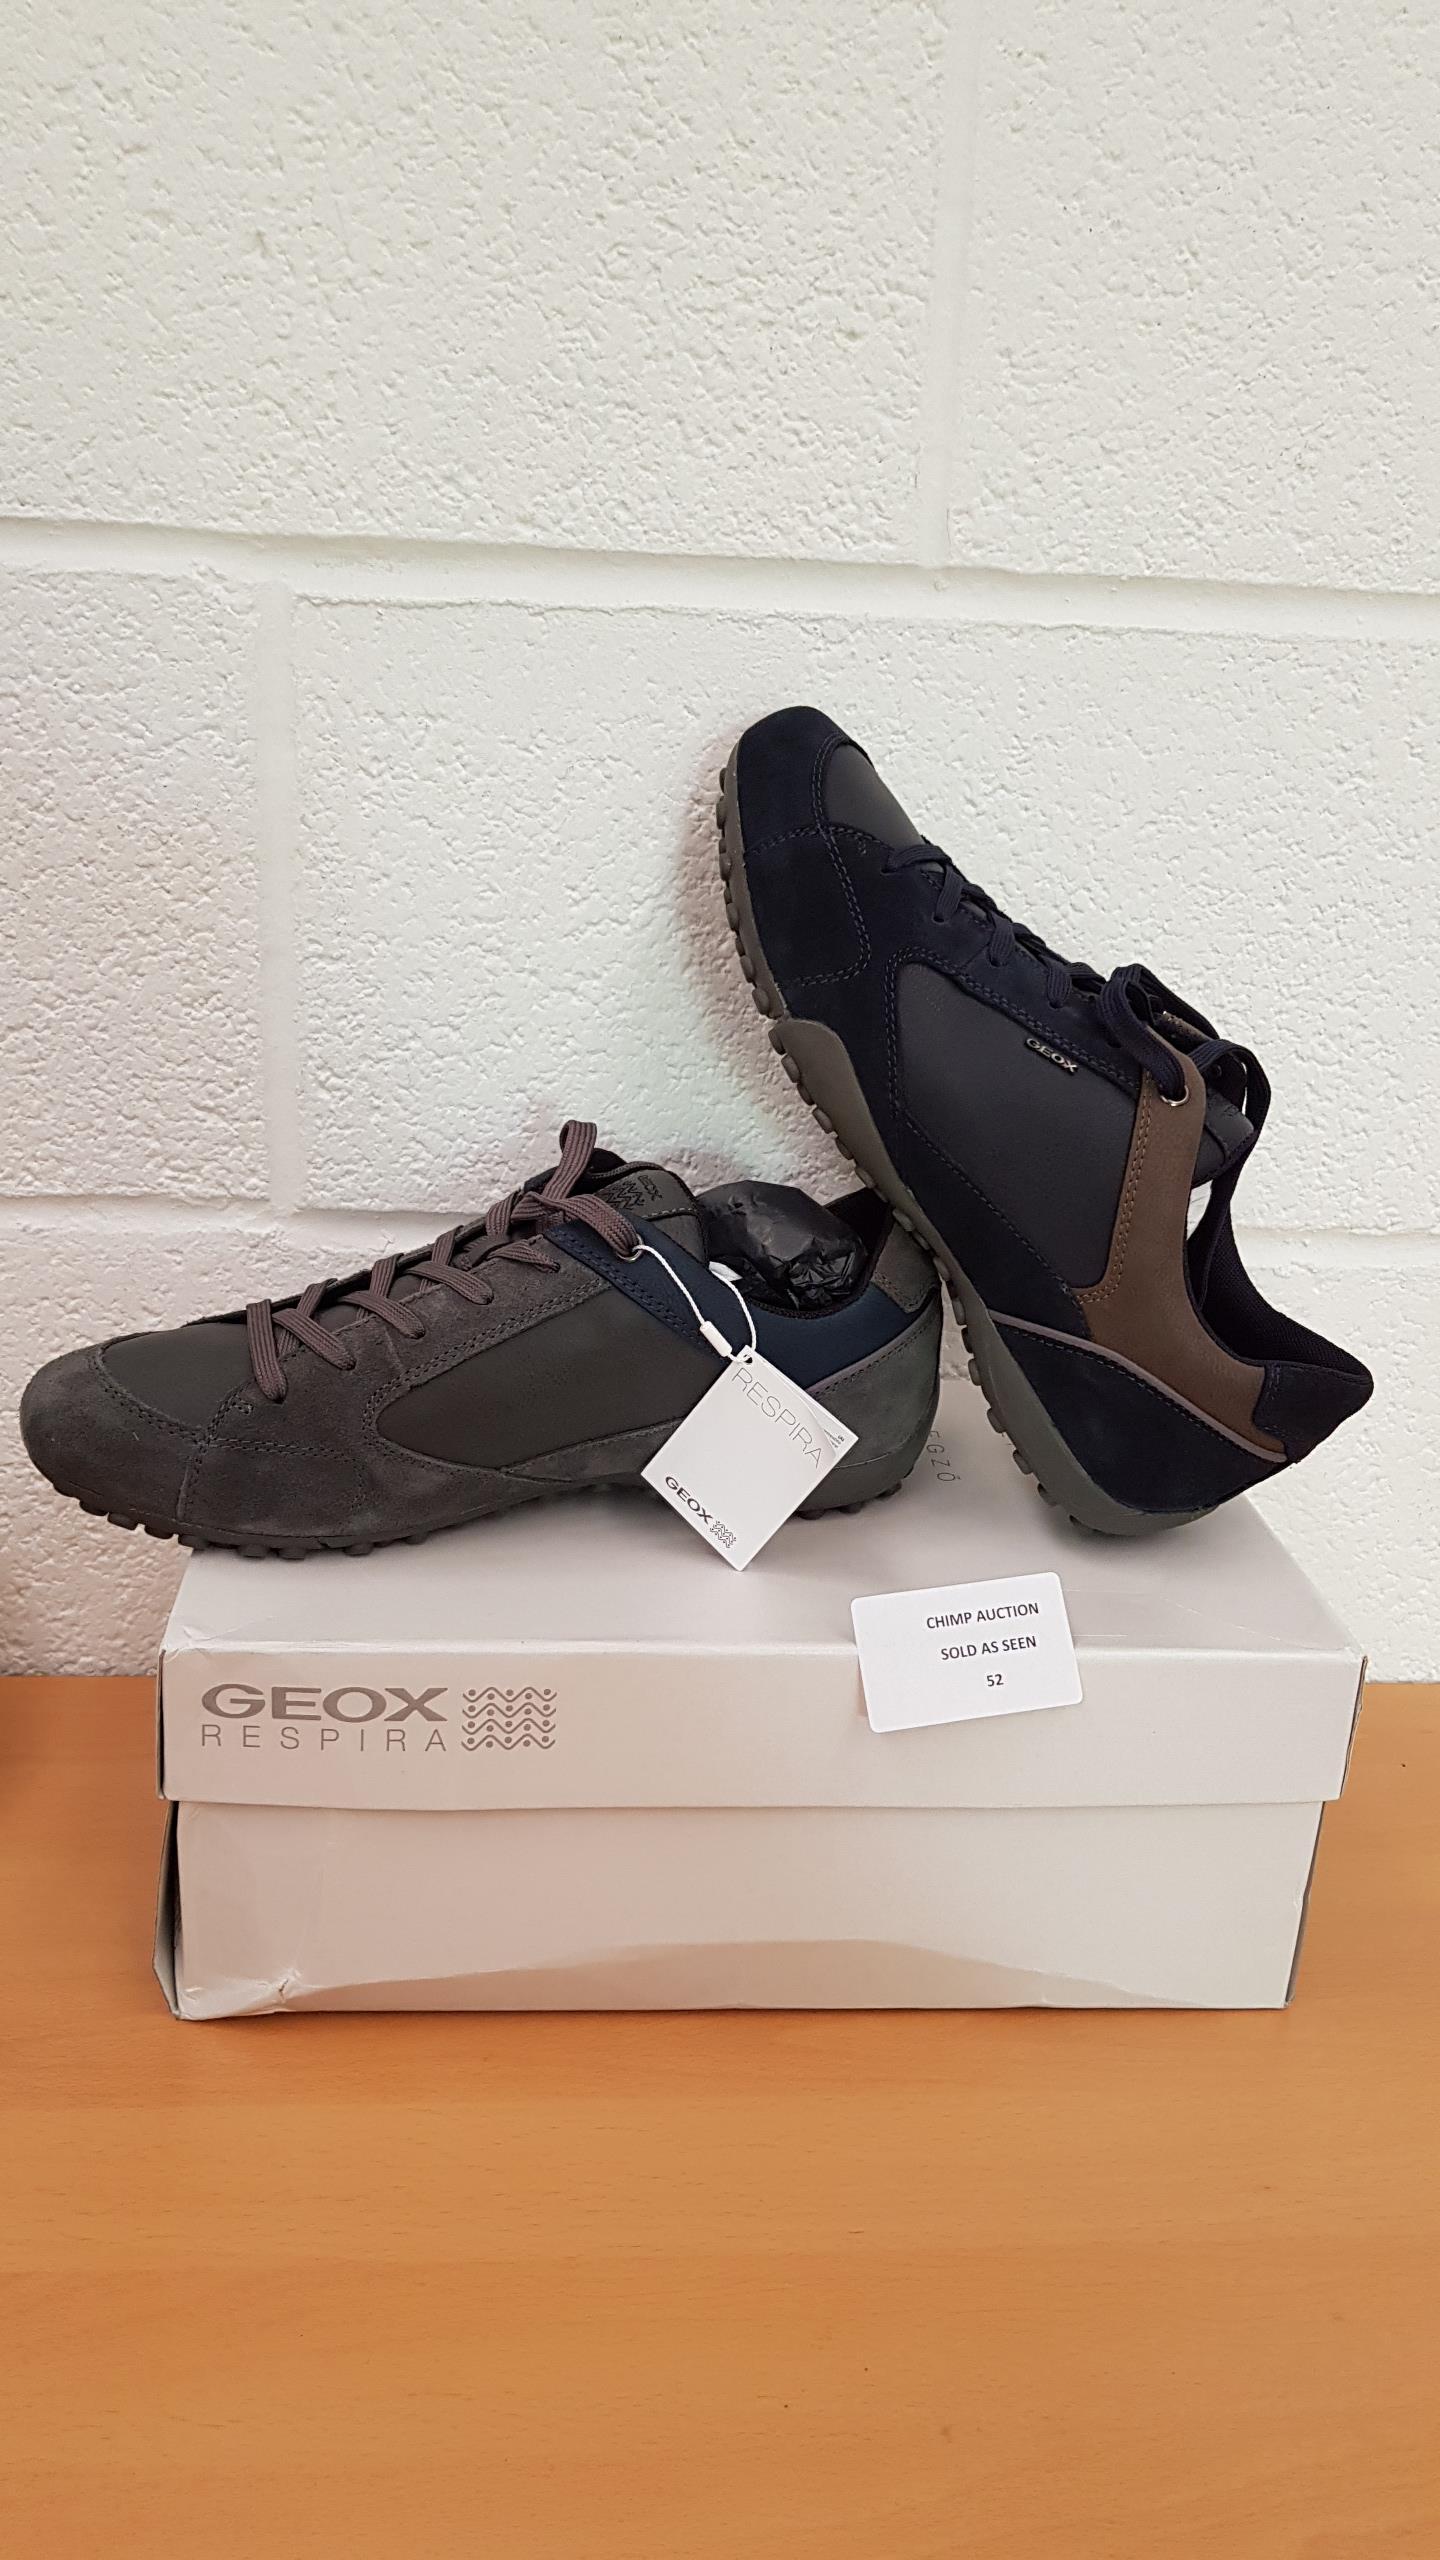 Lot 52 - Geox Respira U Snake Suede shoes UK SIZE 9